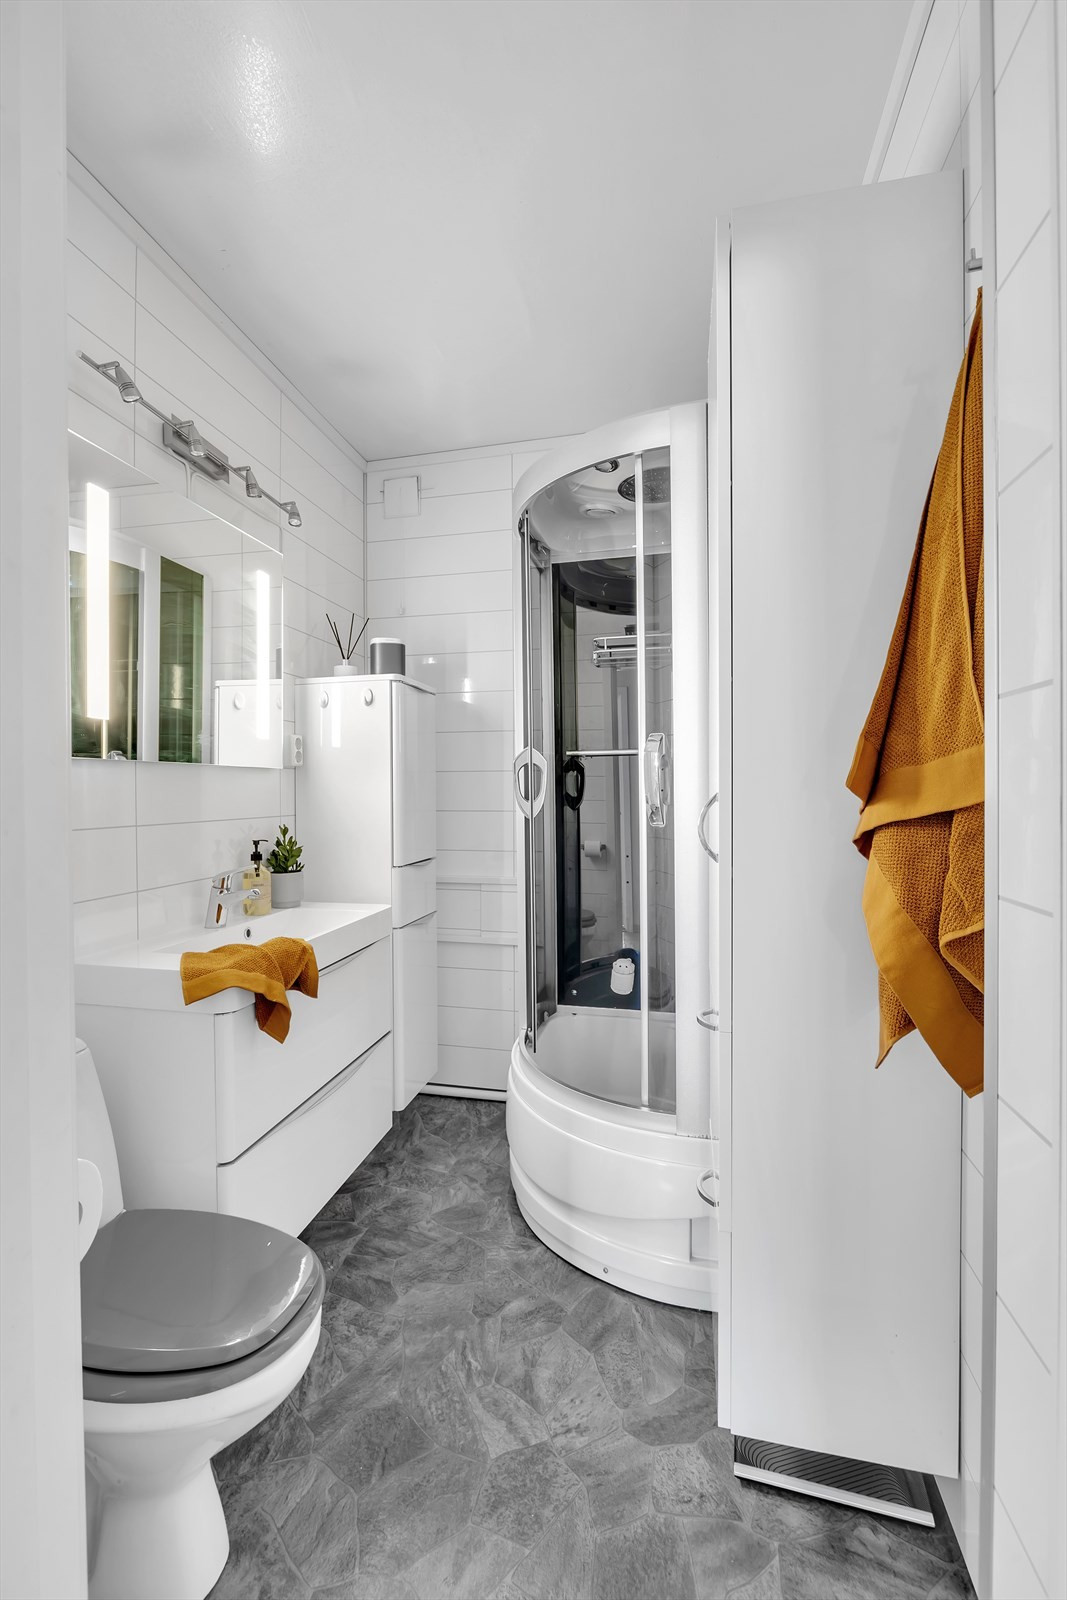 Badet fremstår med positiv kvalitet og gode innretninger